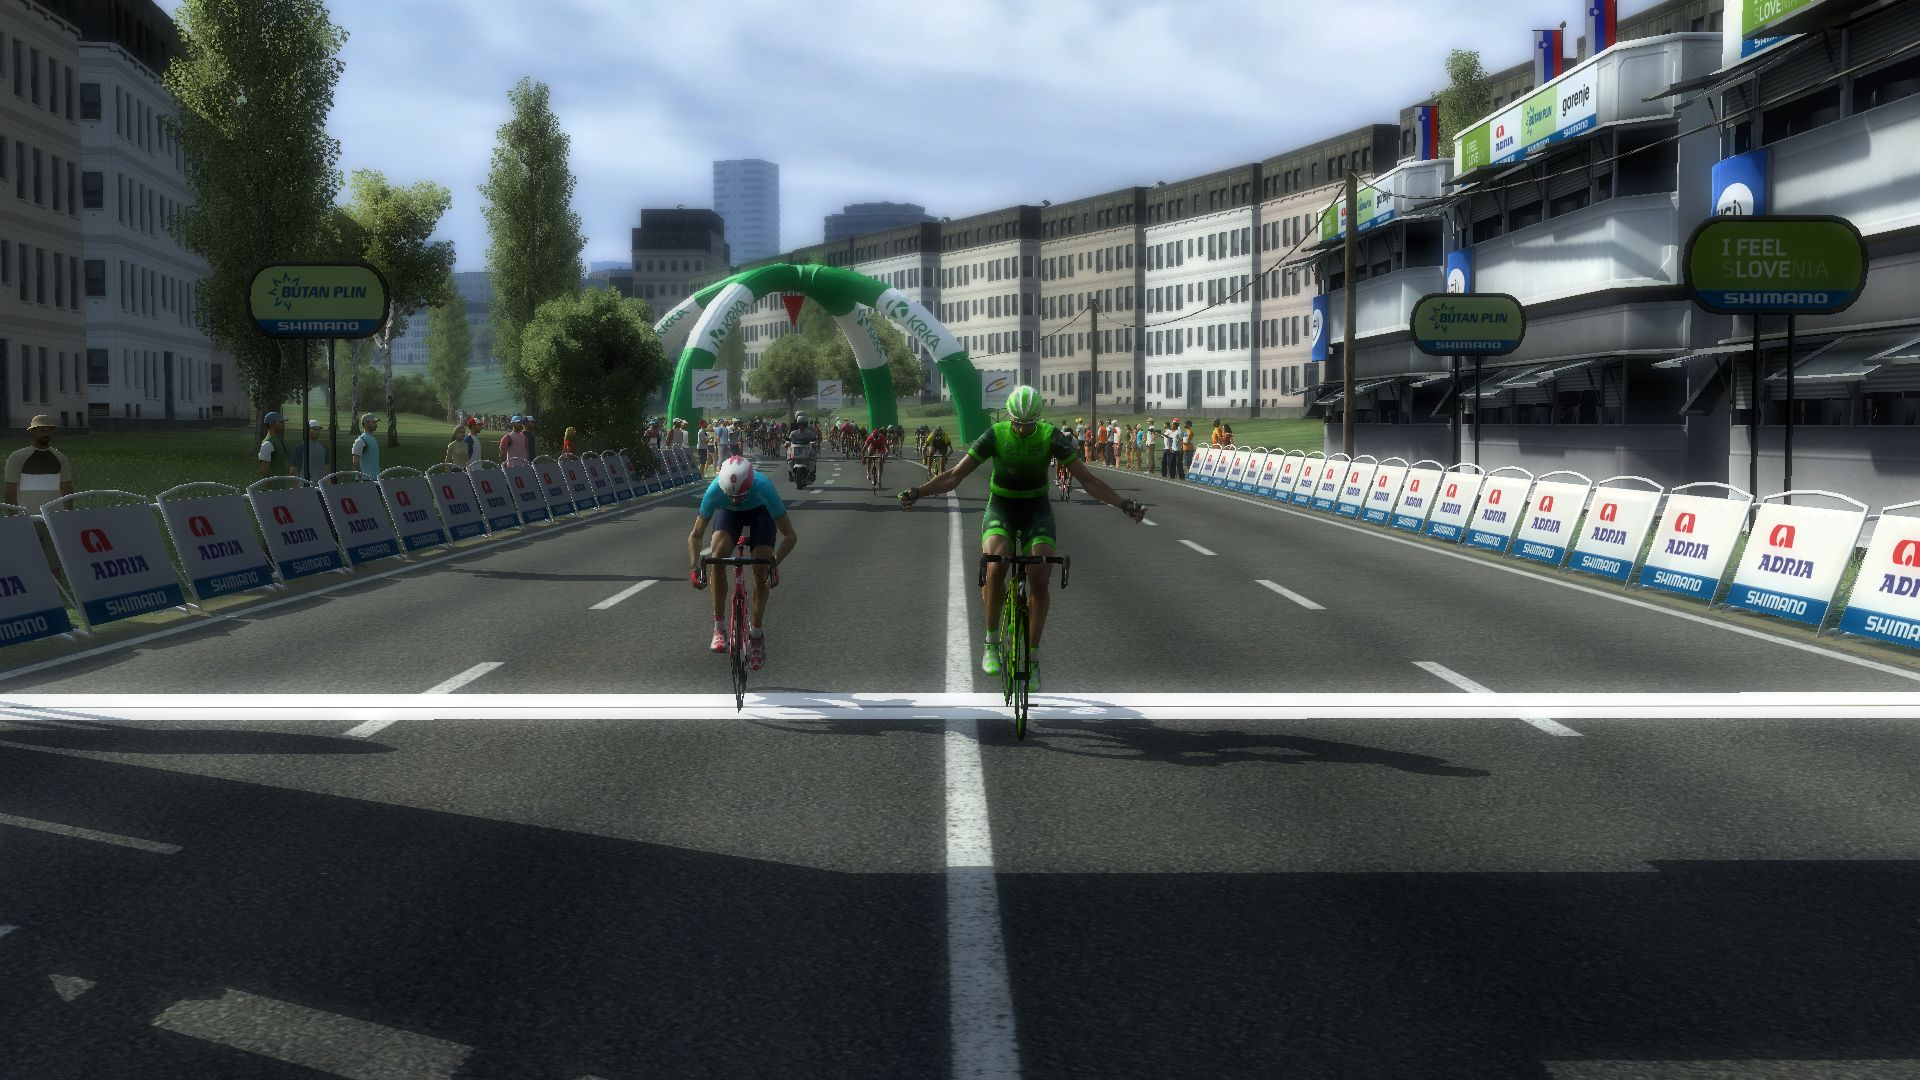 pcmdaily.com/images/mg/2017/Races/C1/Slovenia/TOSS4%2014.jpg